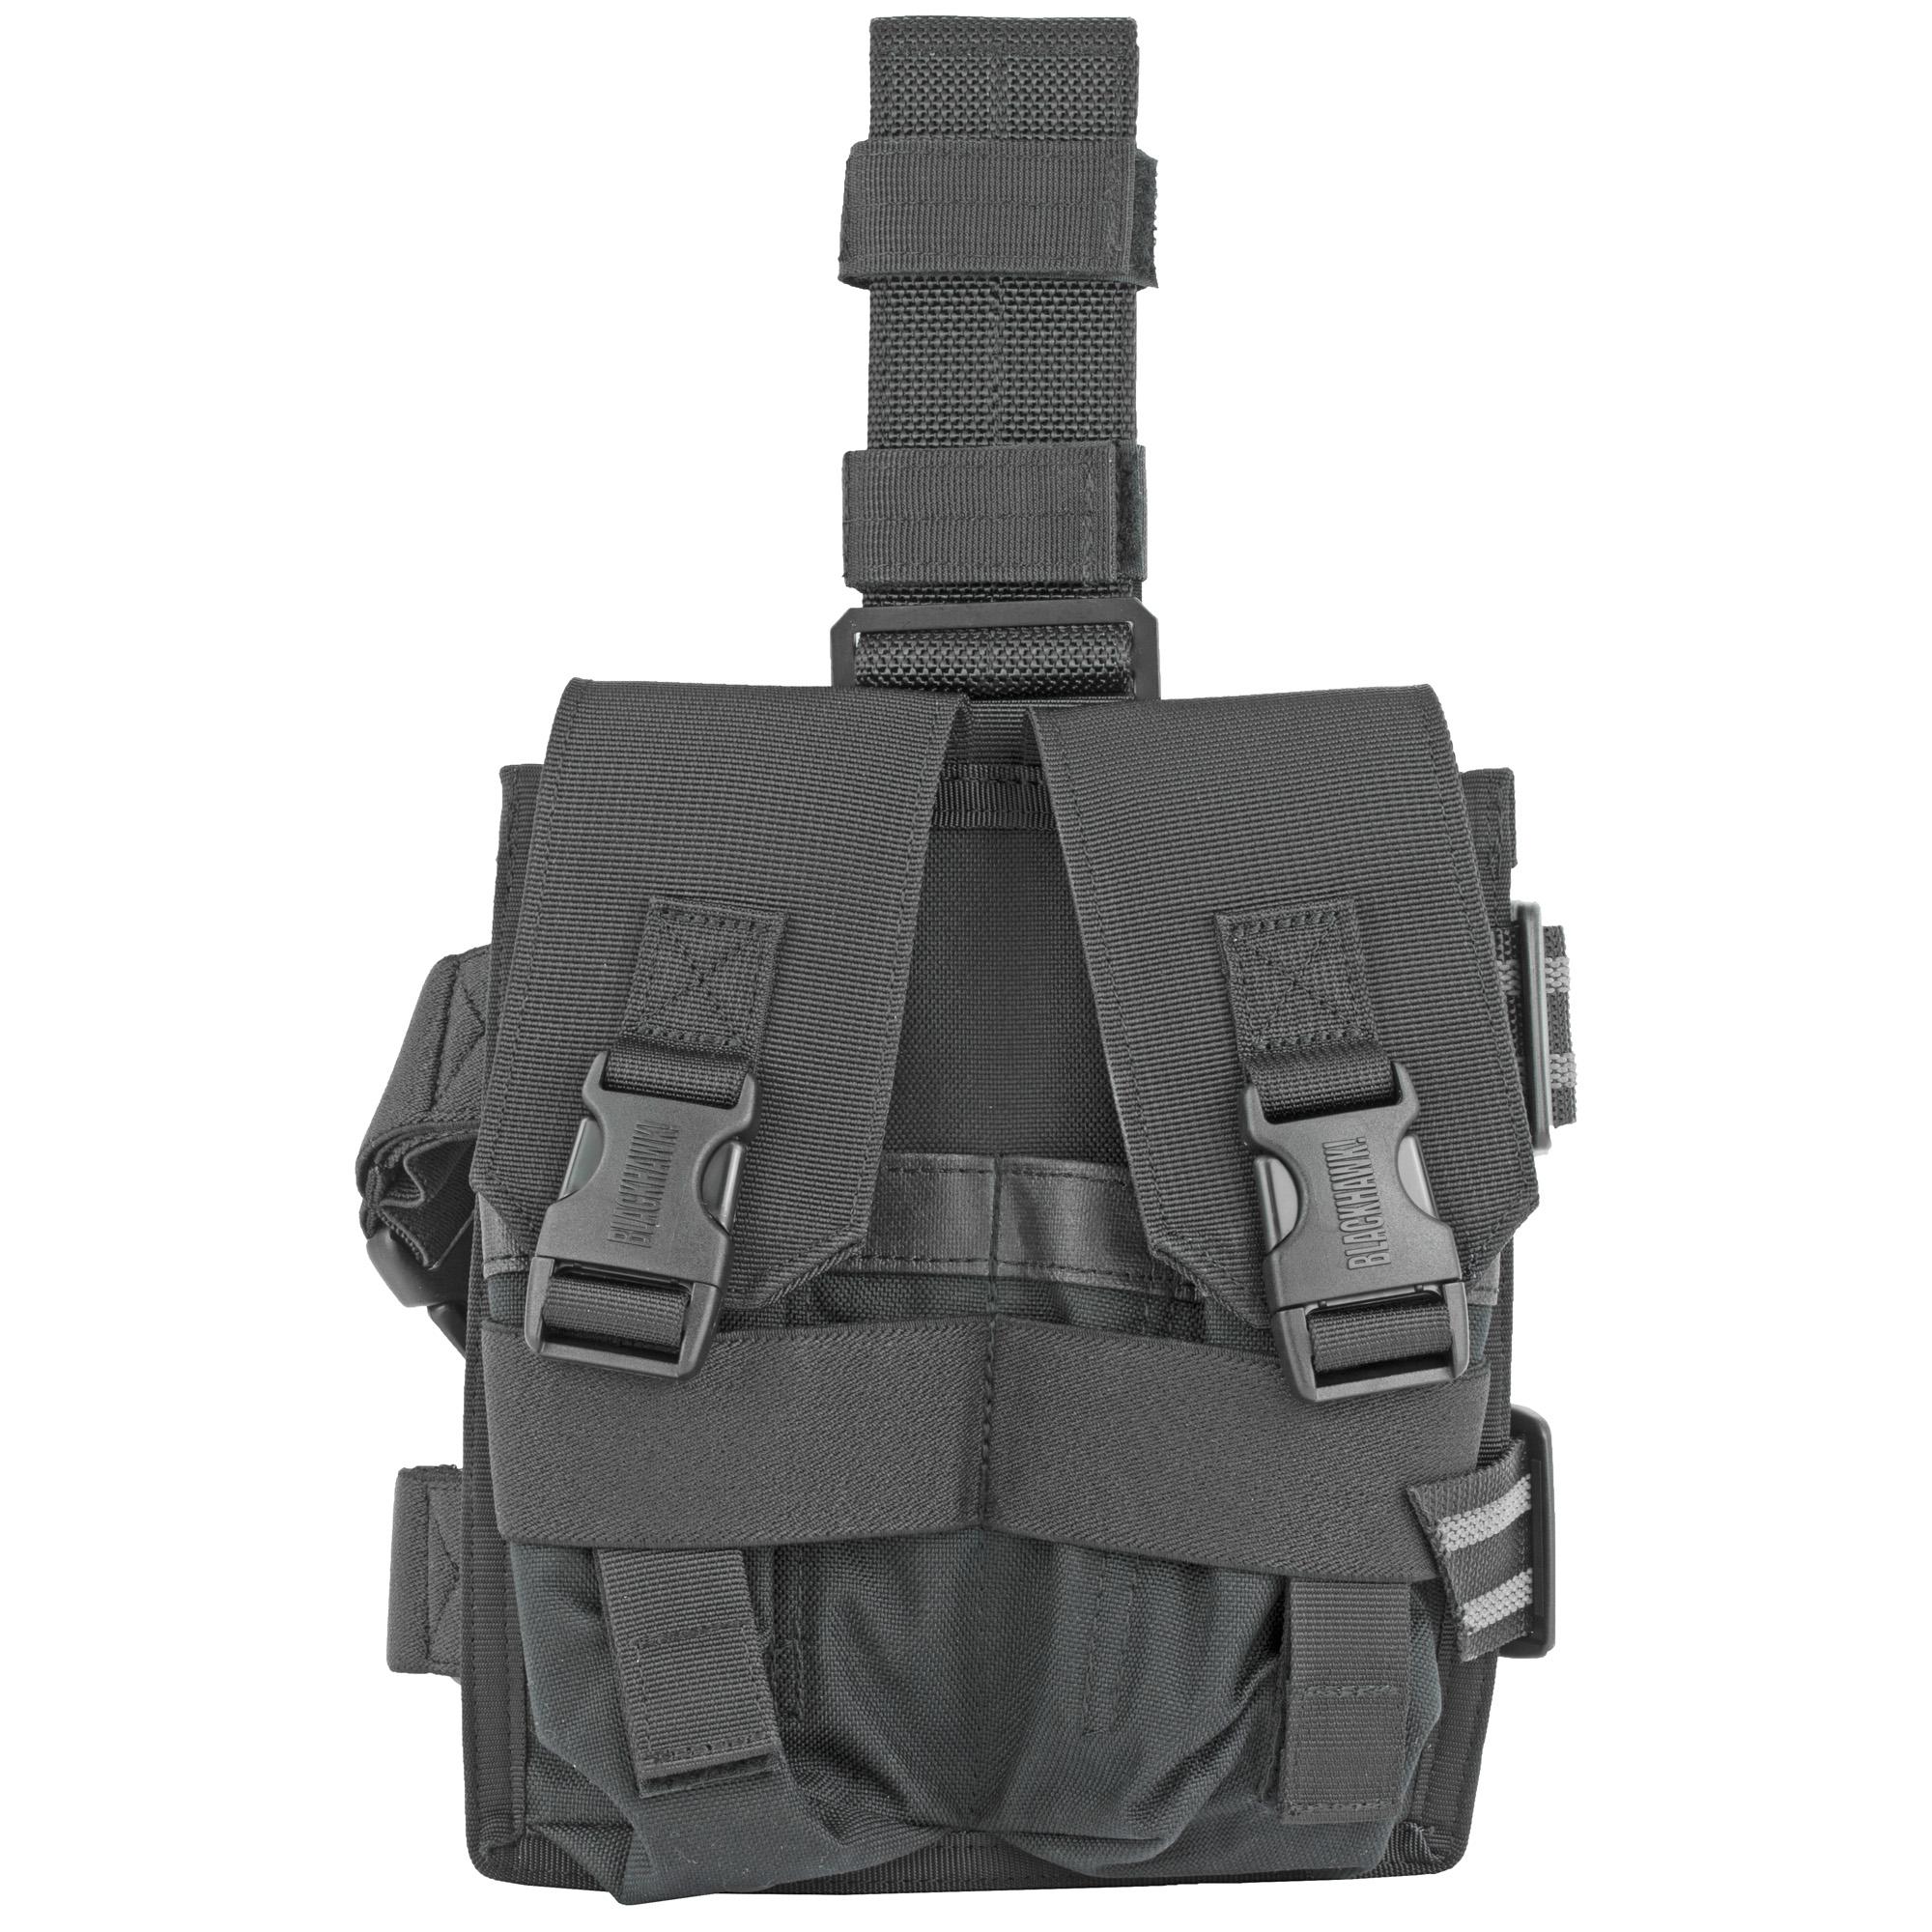 Bh Omega Elite M16 Mag Pch 4 Blk